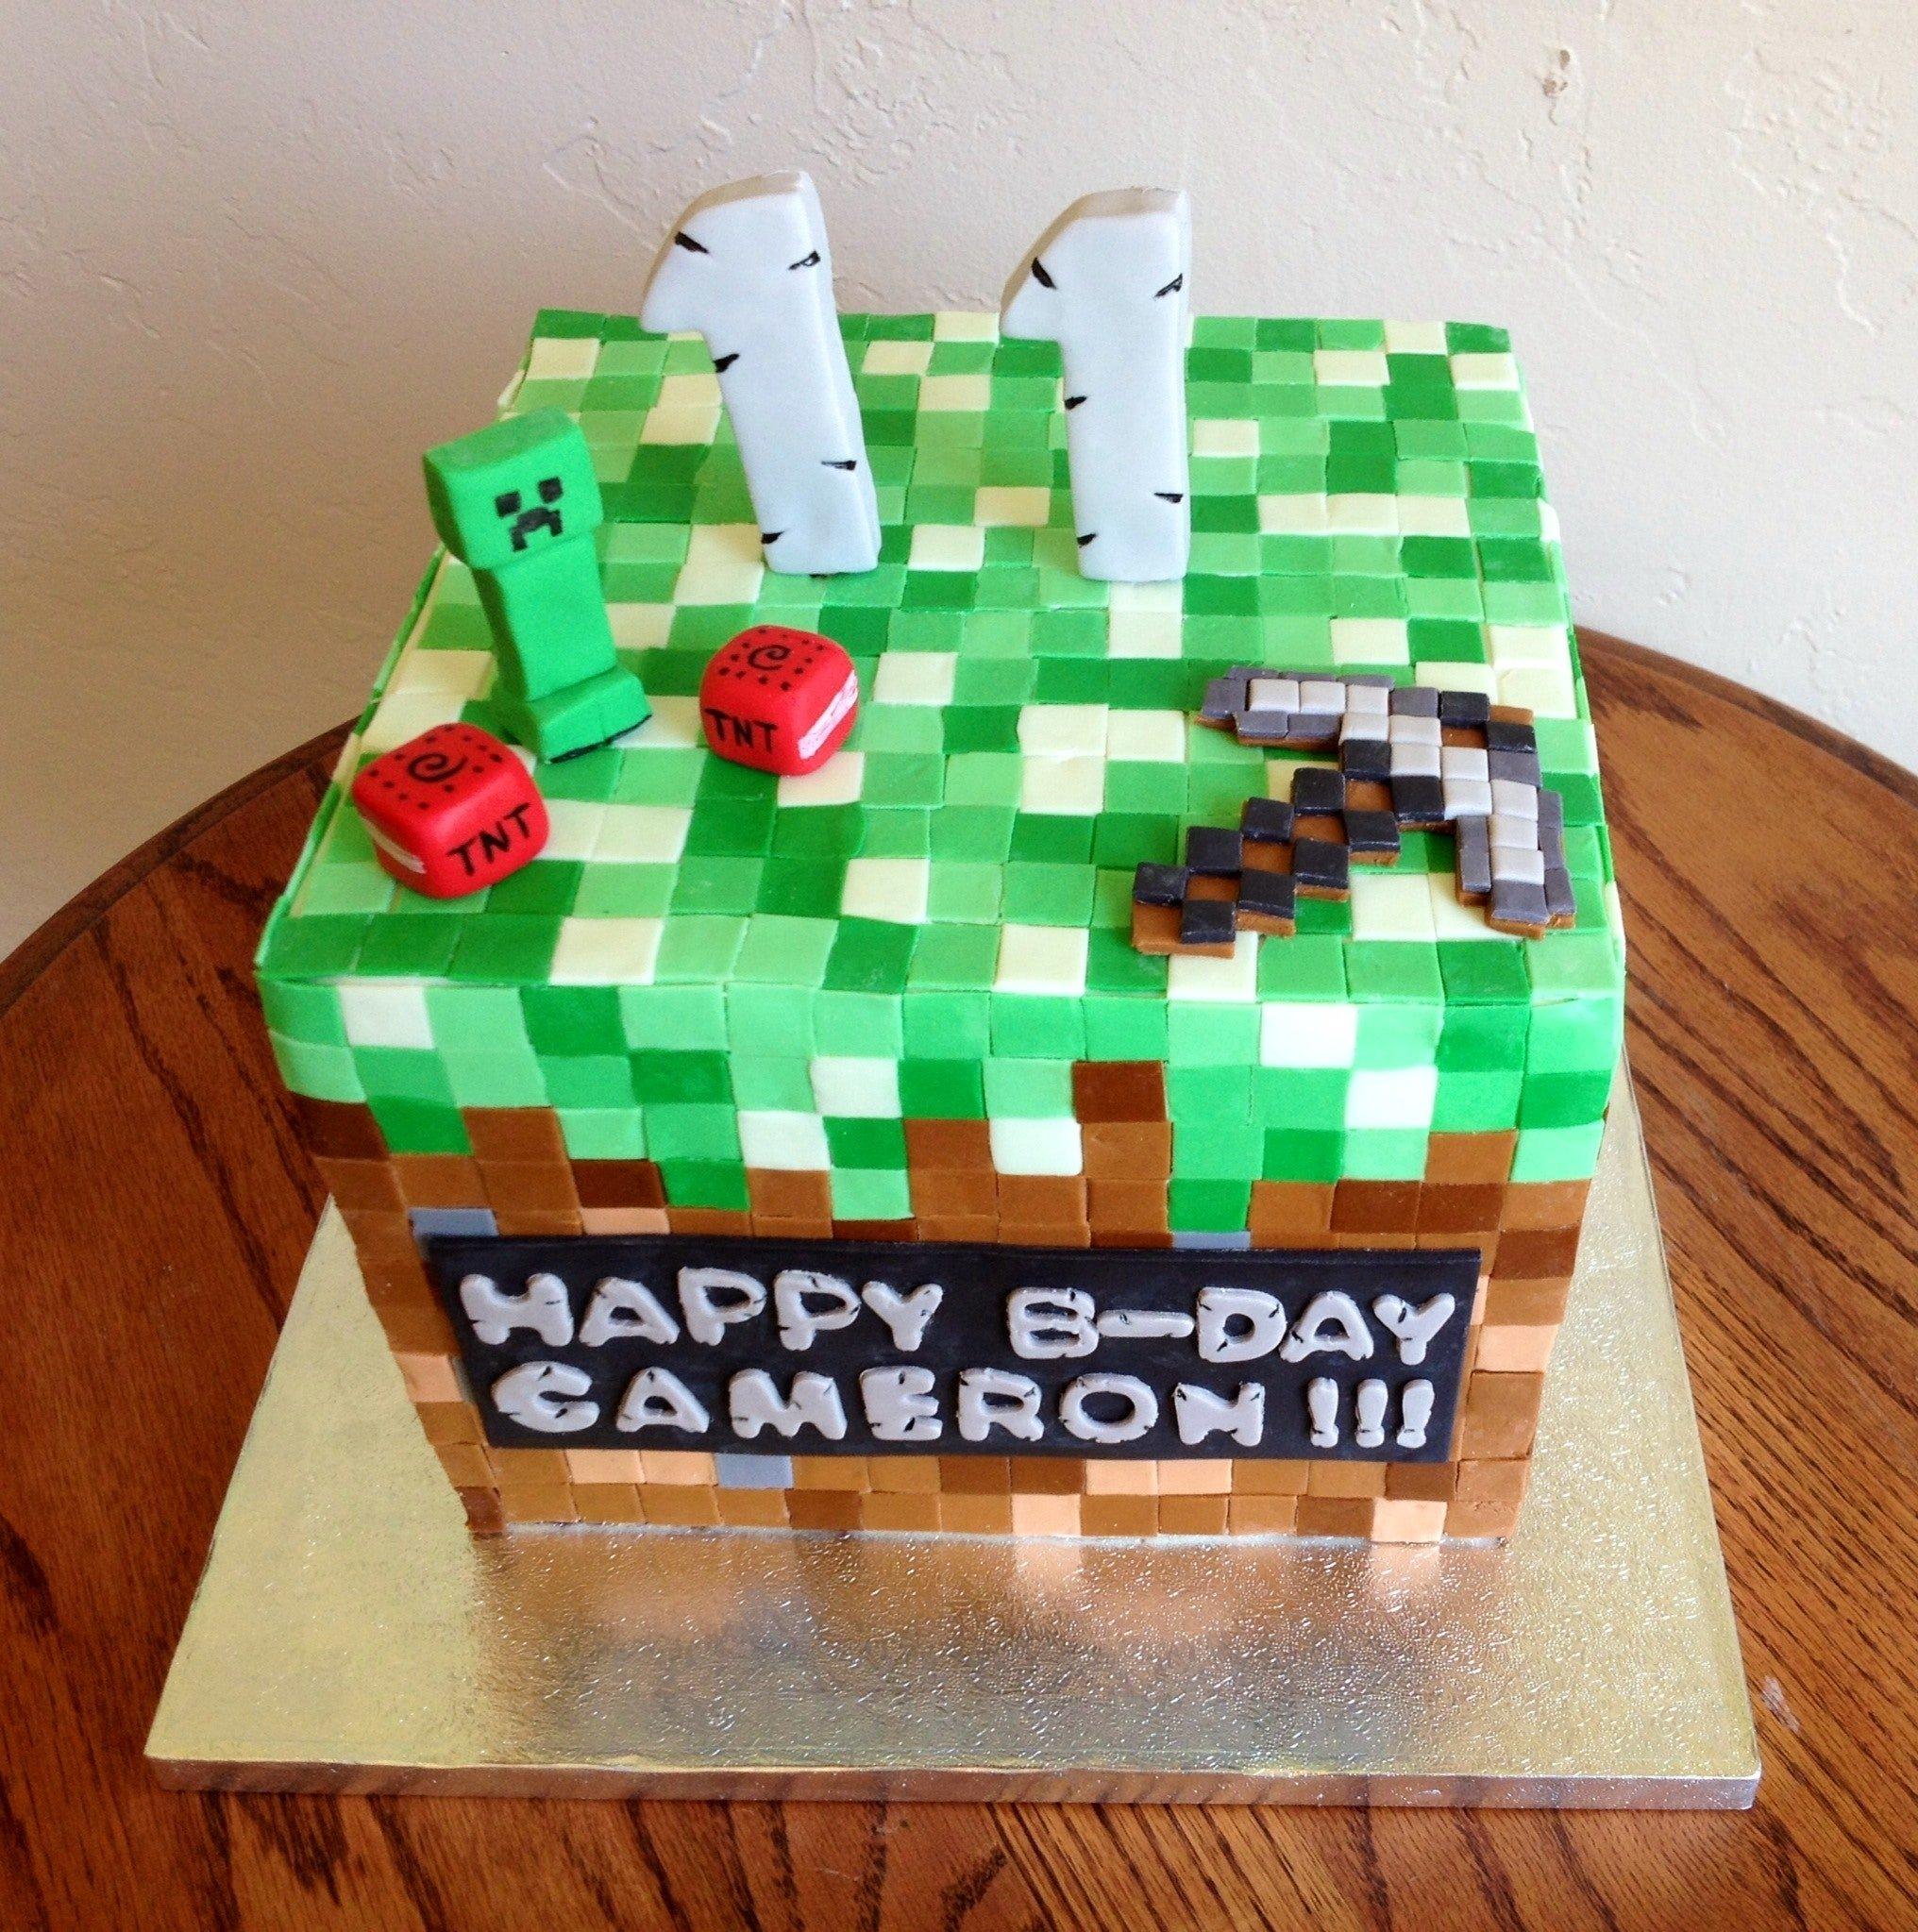 10 Great 14 Year Old Birthday Party Ideas birthday party ideas 14 year old intended for birthday cake ideas 14 2021